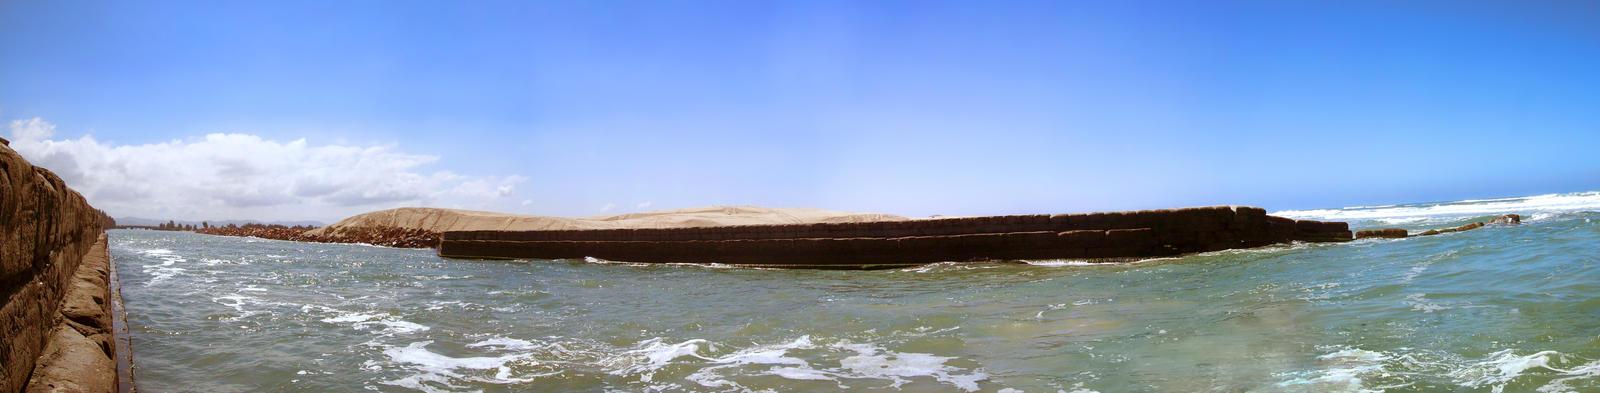 Sambaqui Dunes - Camacho, SC, Brazil (Panorama 4) by Ishtaryu